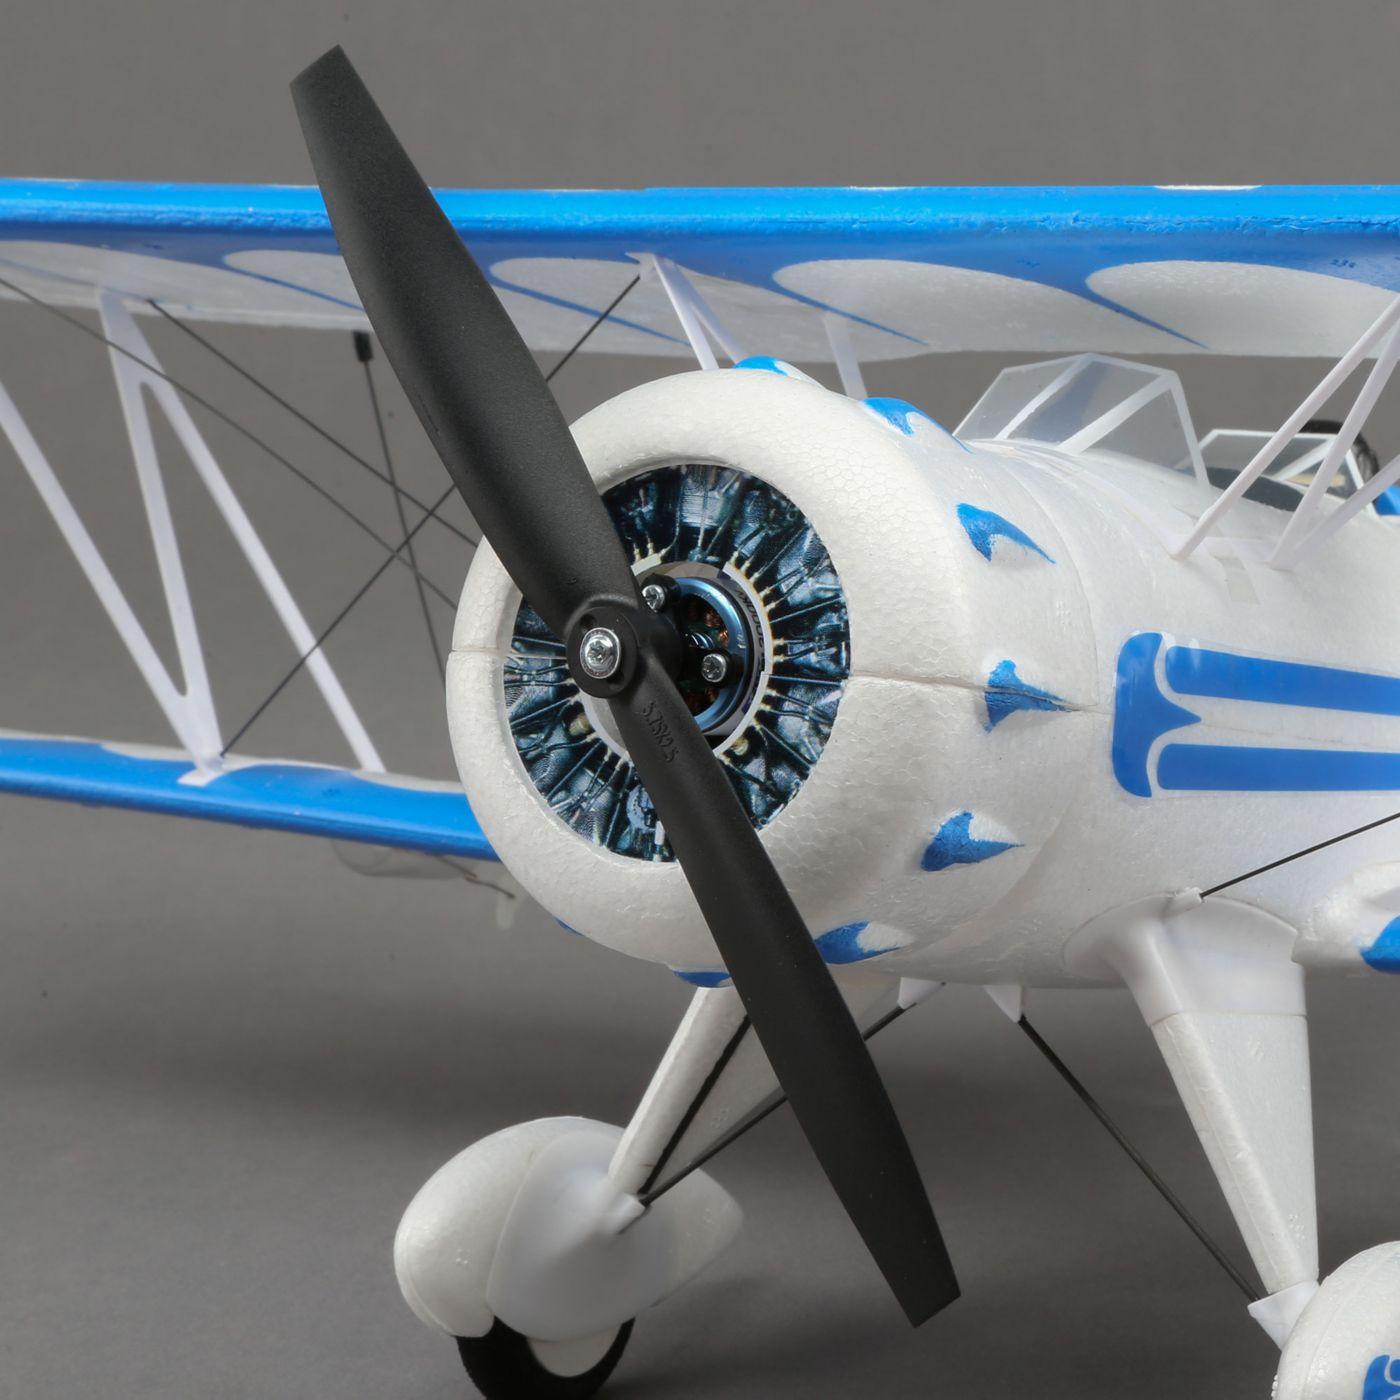 E Flite Umx Waco Bl Bnf Basic Ultra Micro Rc Biplane Airplane Name Acjpgviews 7775size 418 Kb Categories